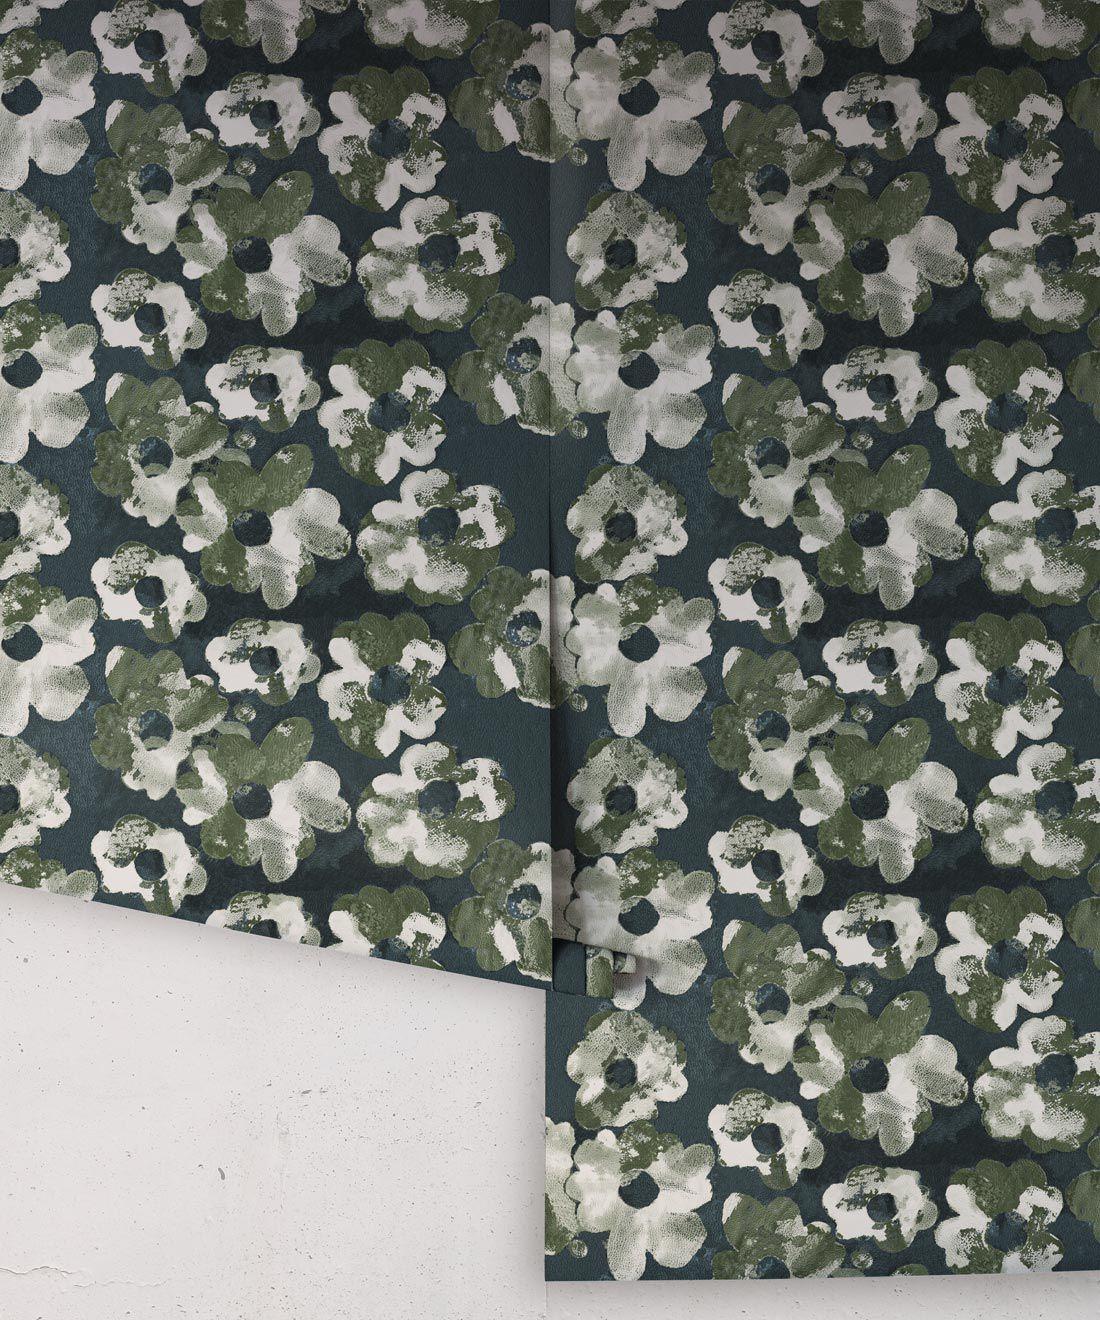 Cherry Blossom Wallpaper Night • Shibori Floral • NightRolls